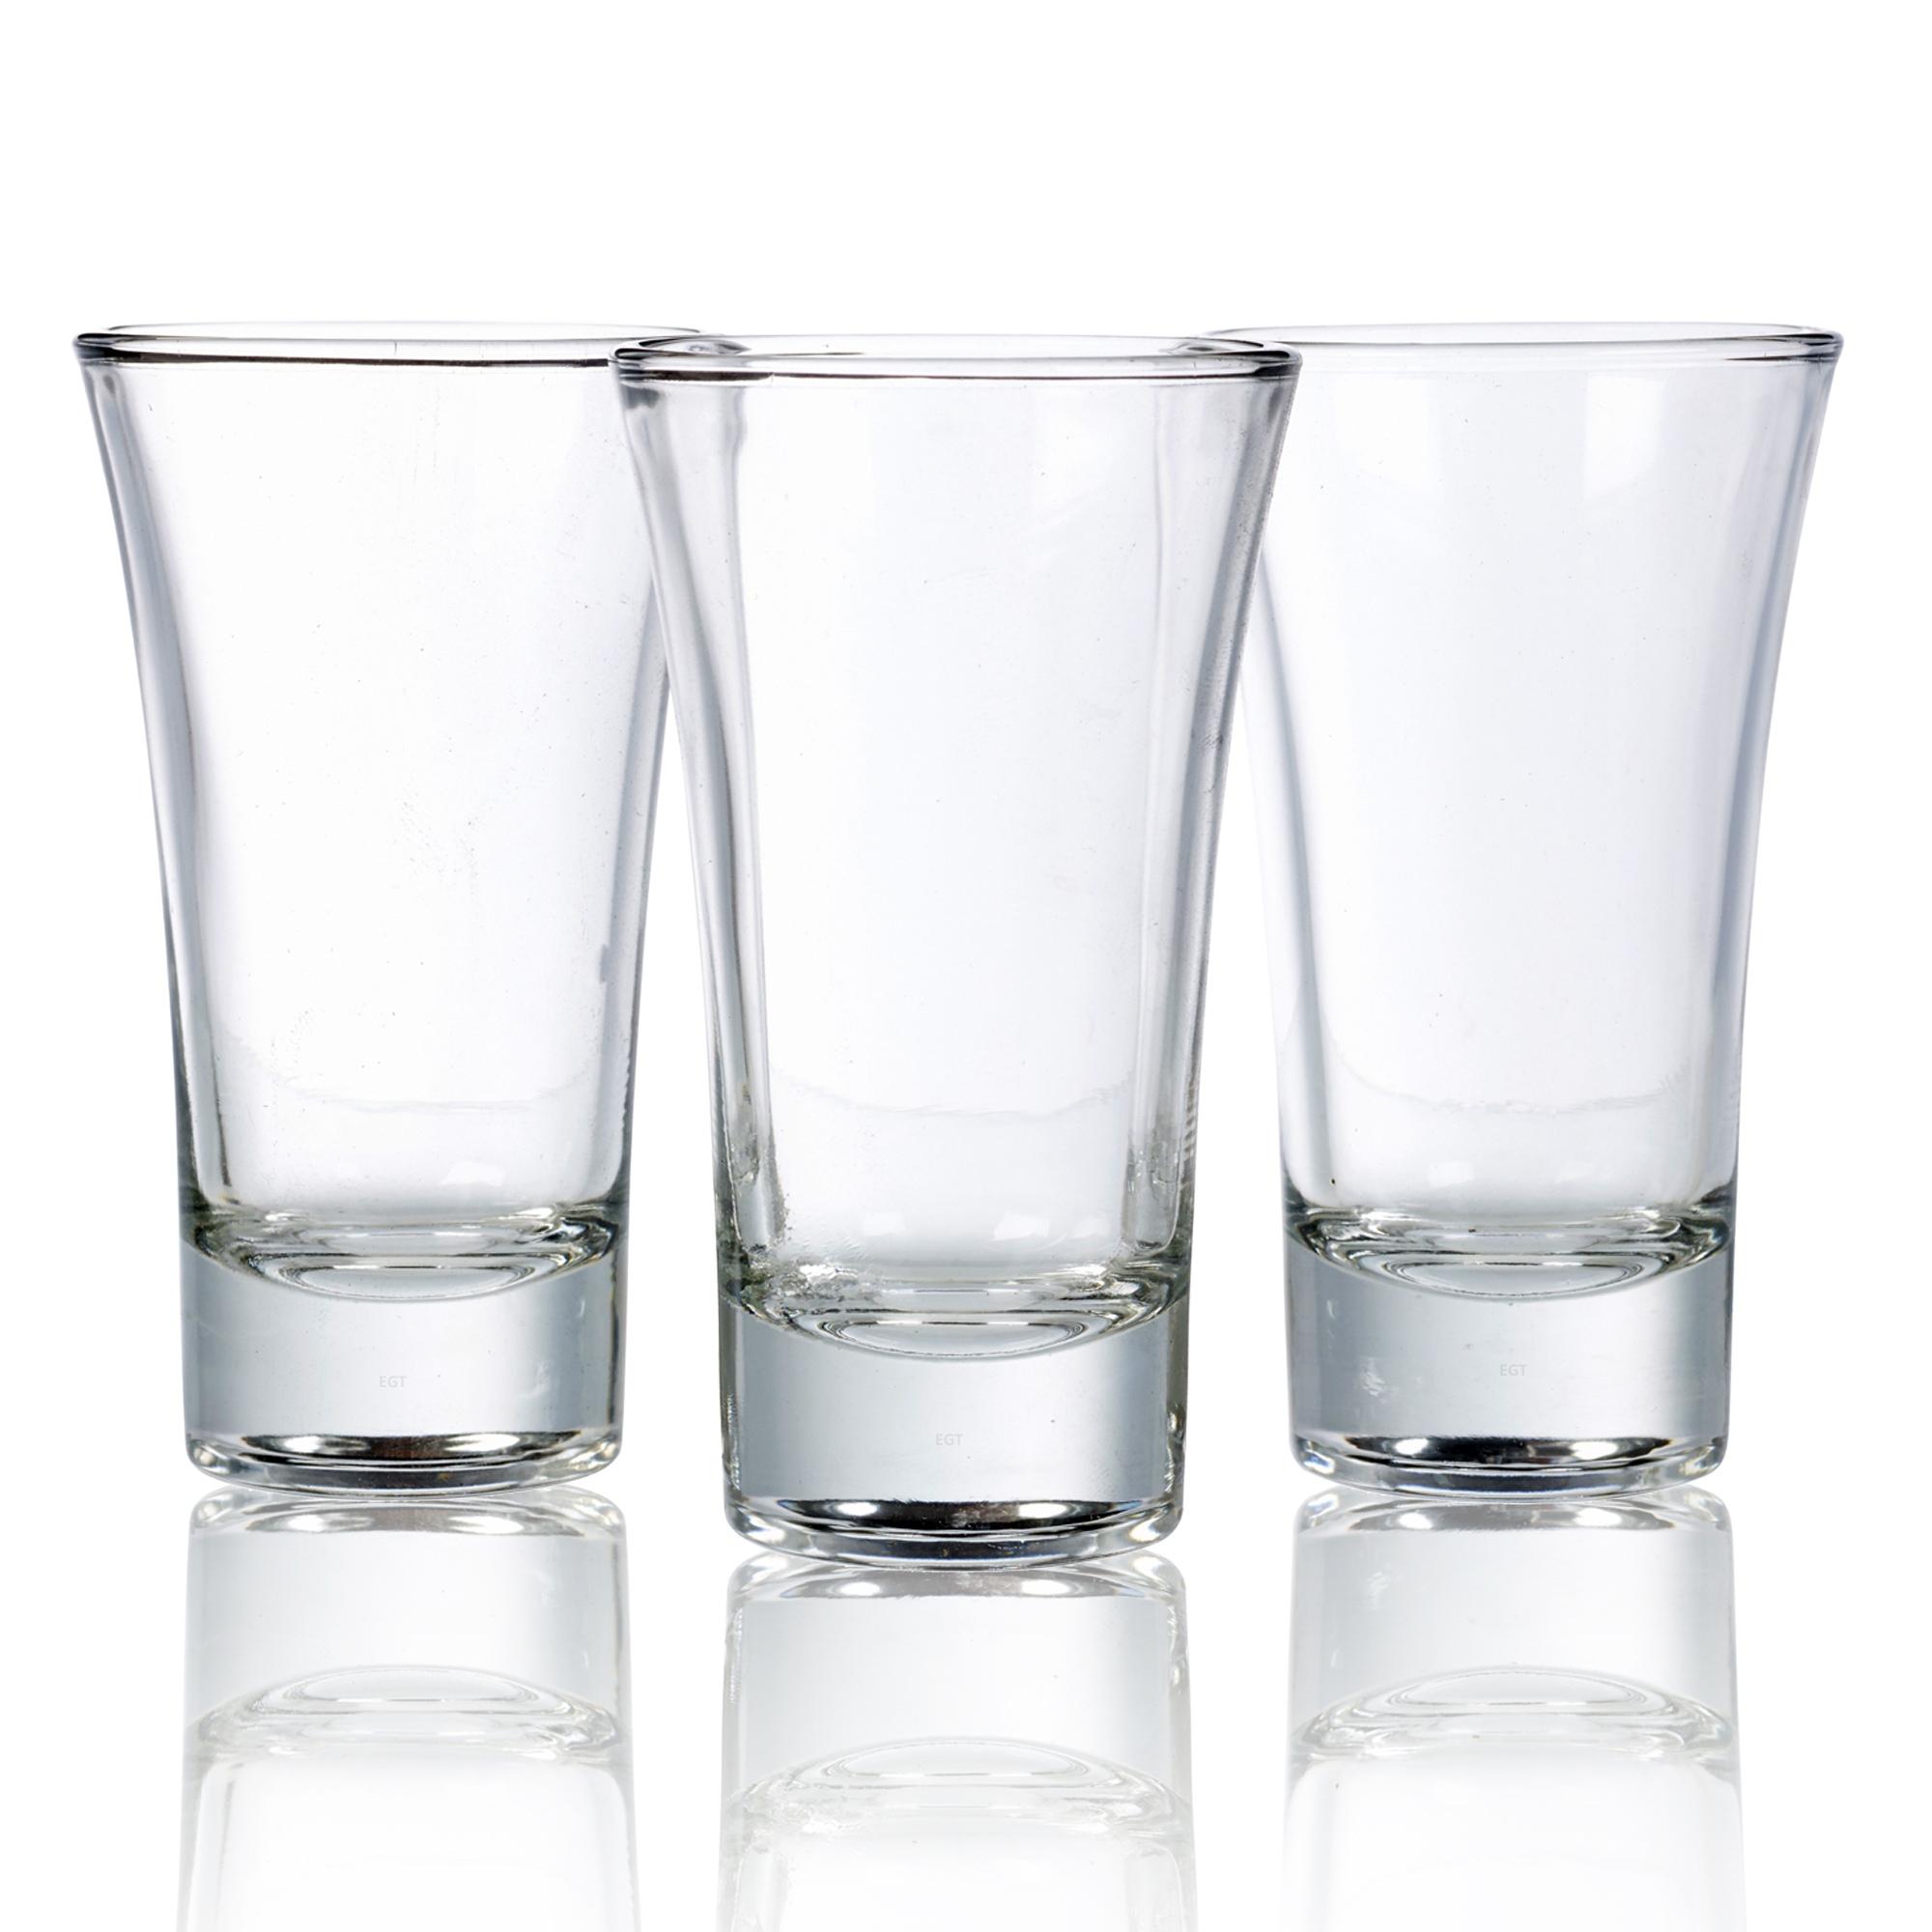 Double Shot Glass Dimensions